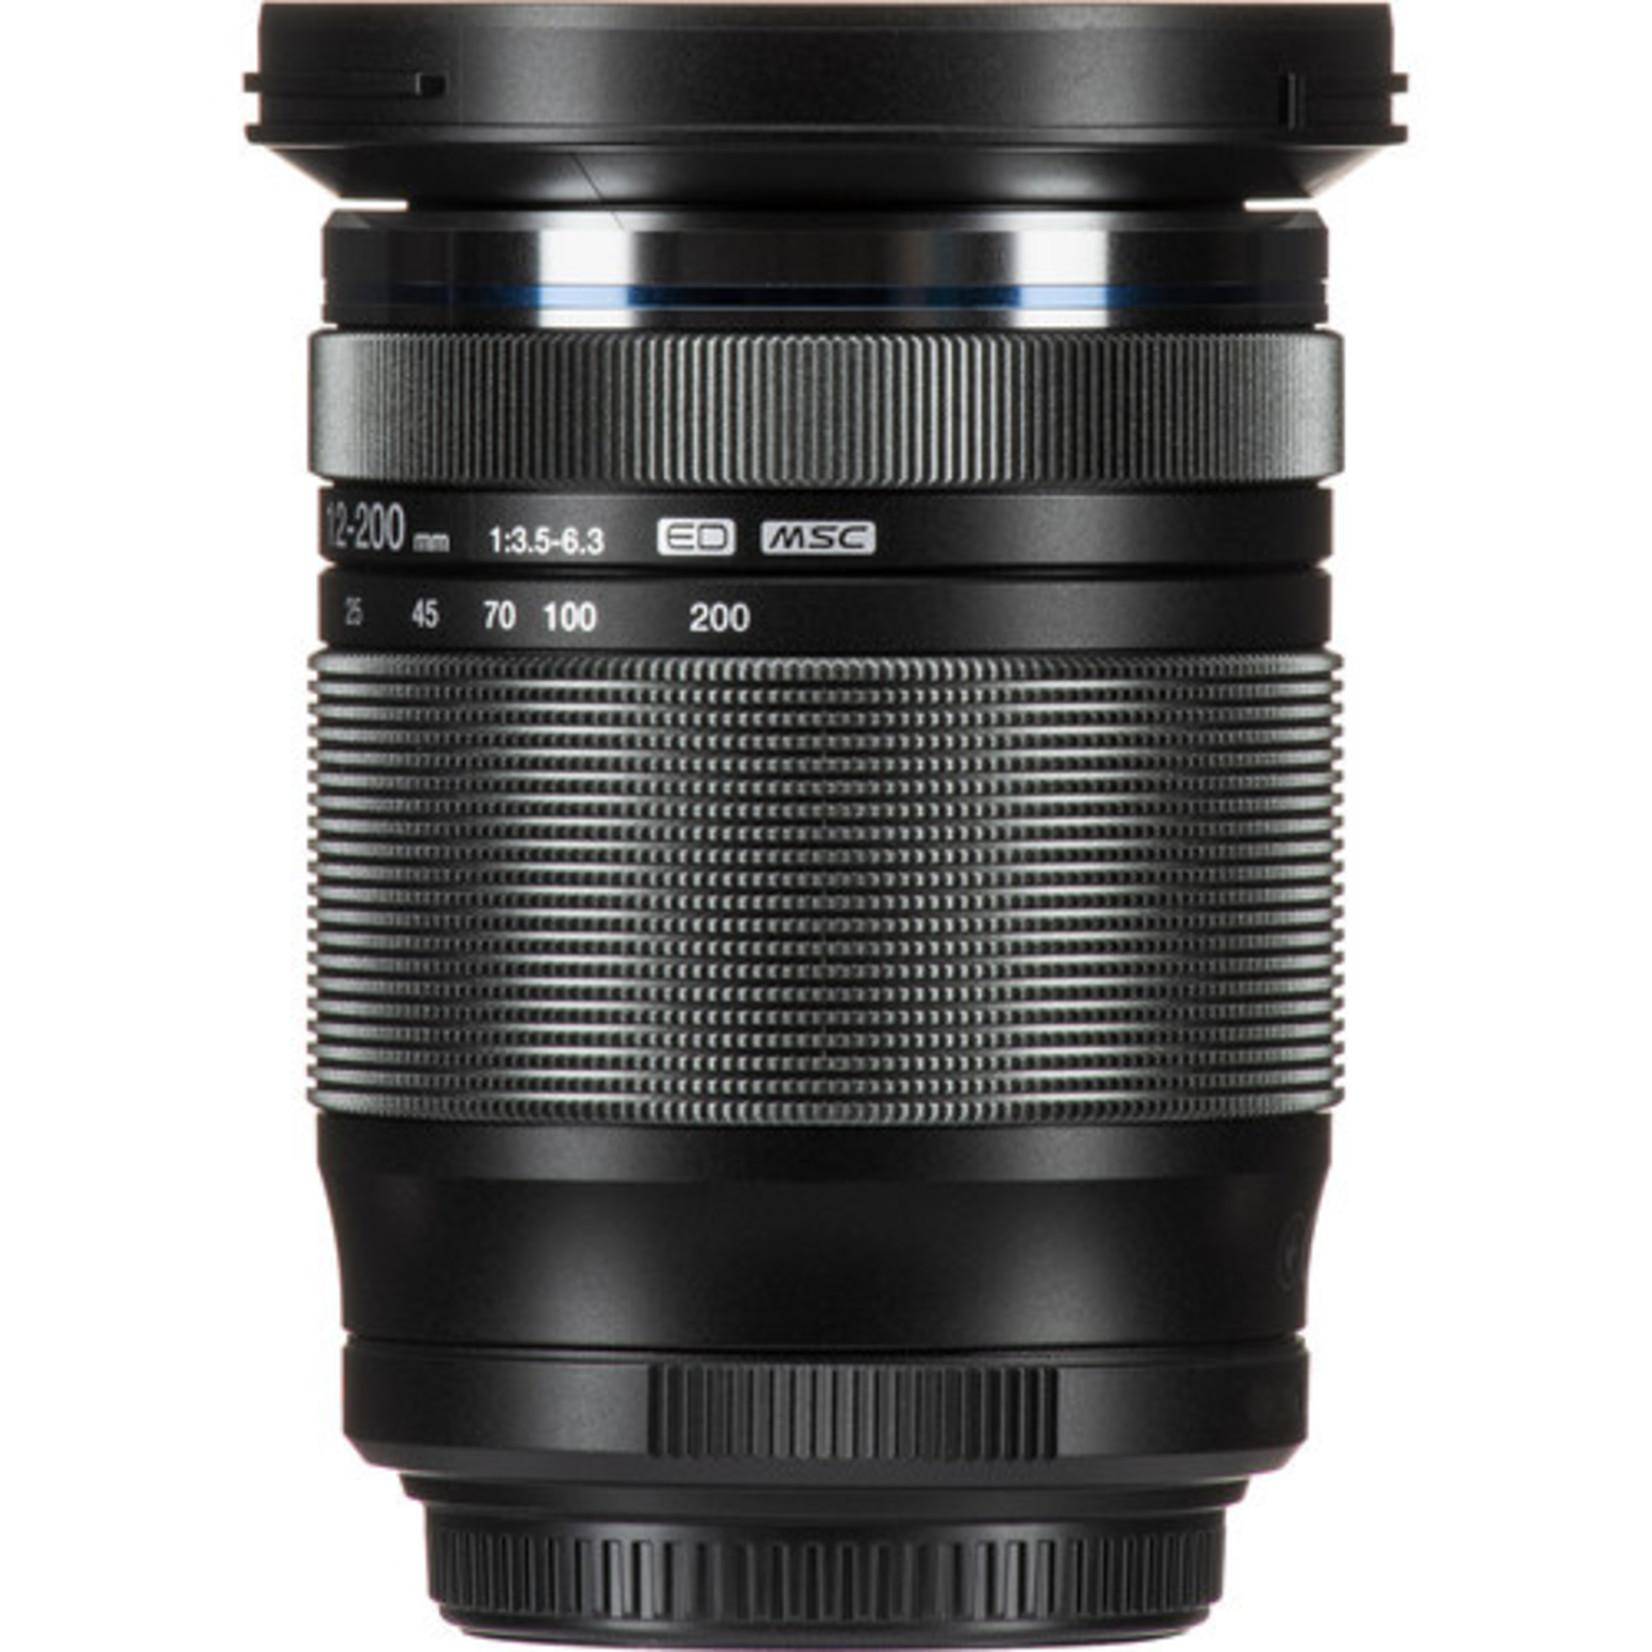 Olympus Olympus M.Zuiko Digital ED 12-200mm f/3.5-6.3 Lens